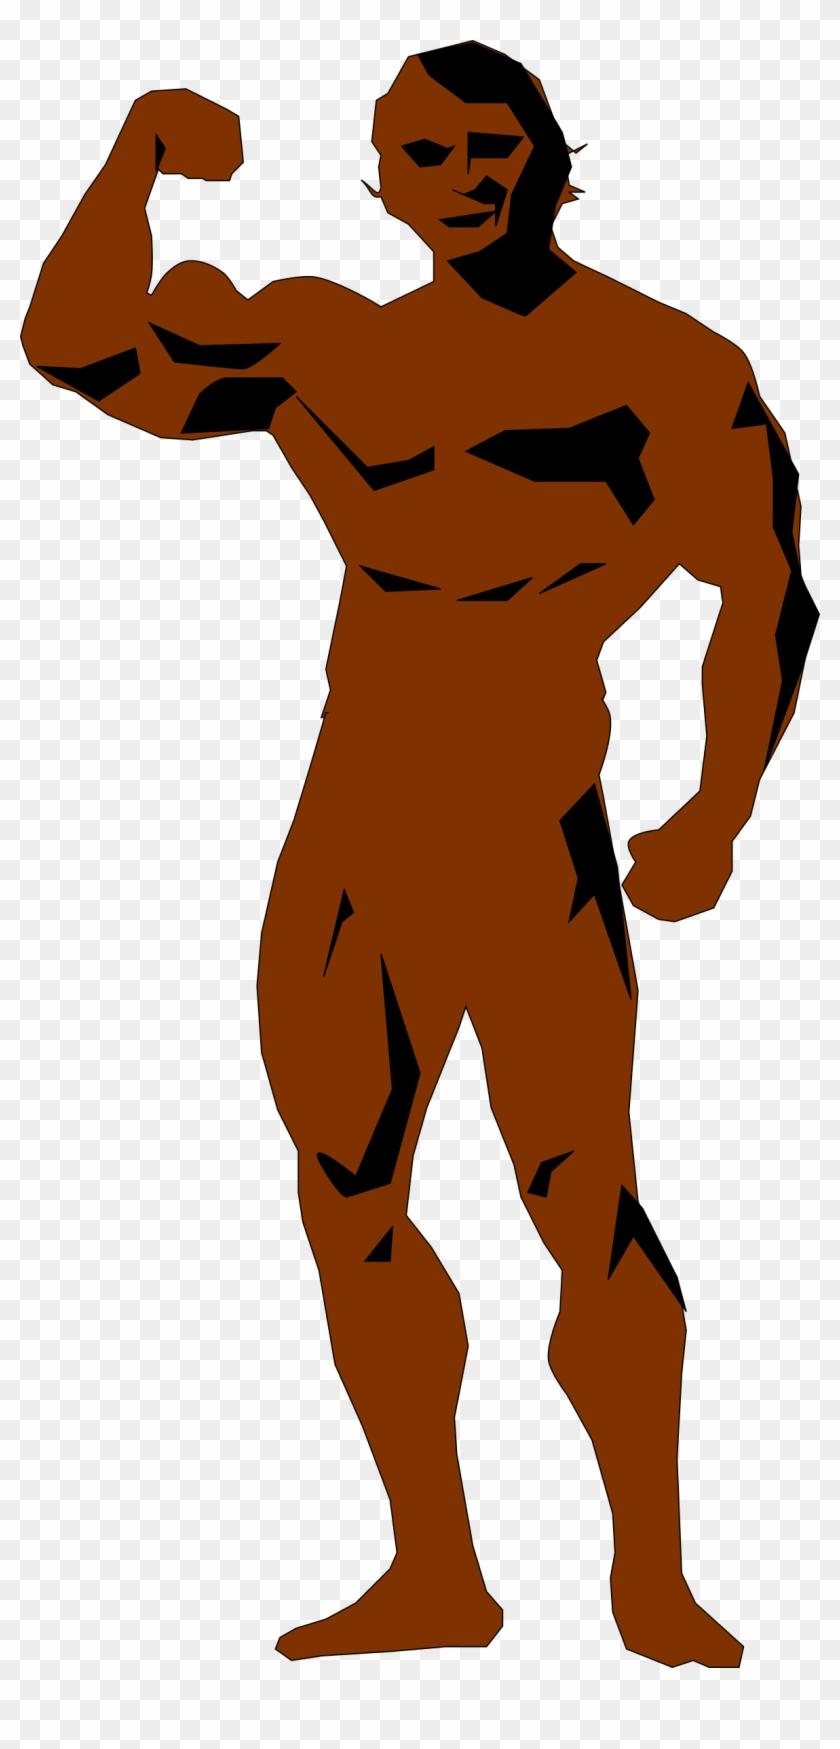 Body Builder - Big Body Clipart #86244